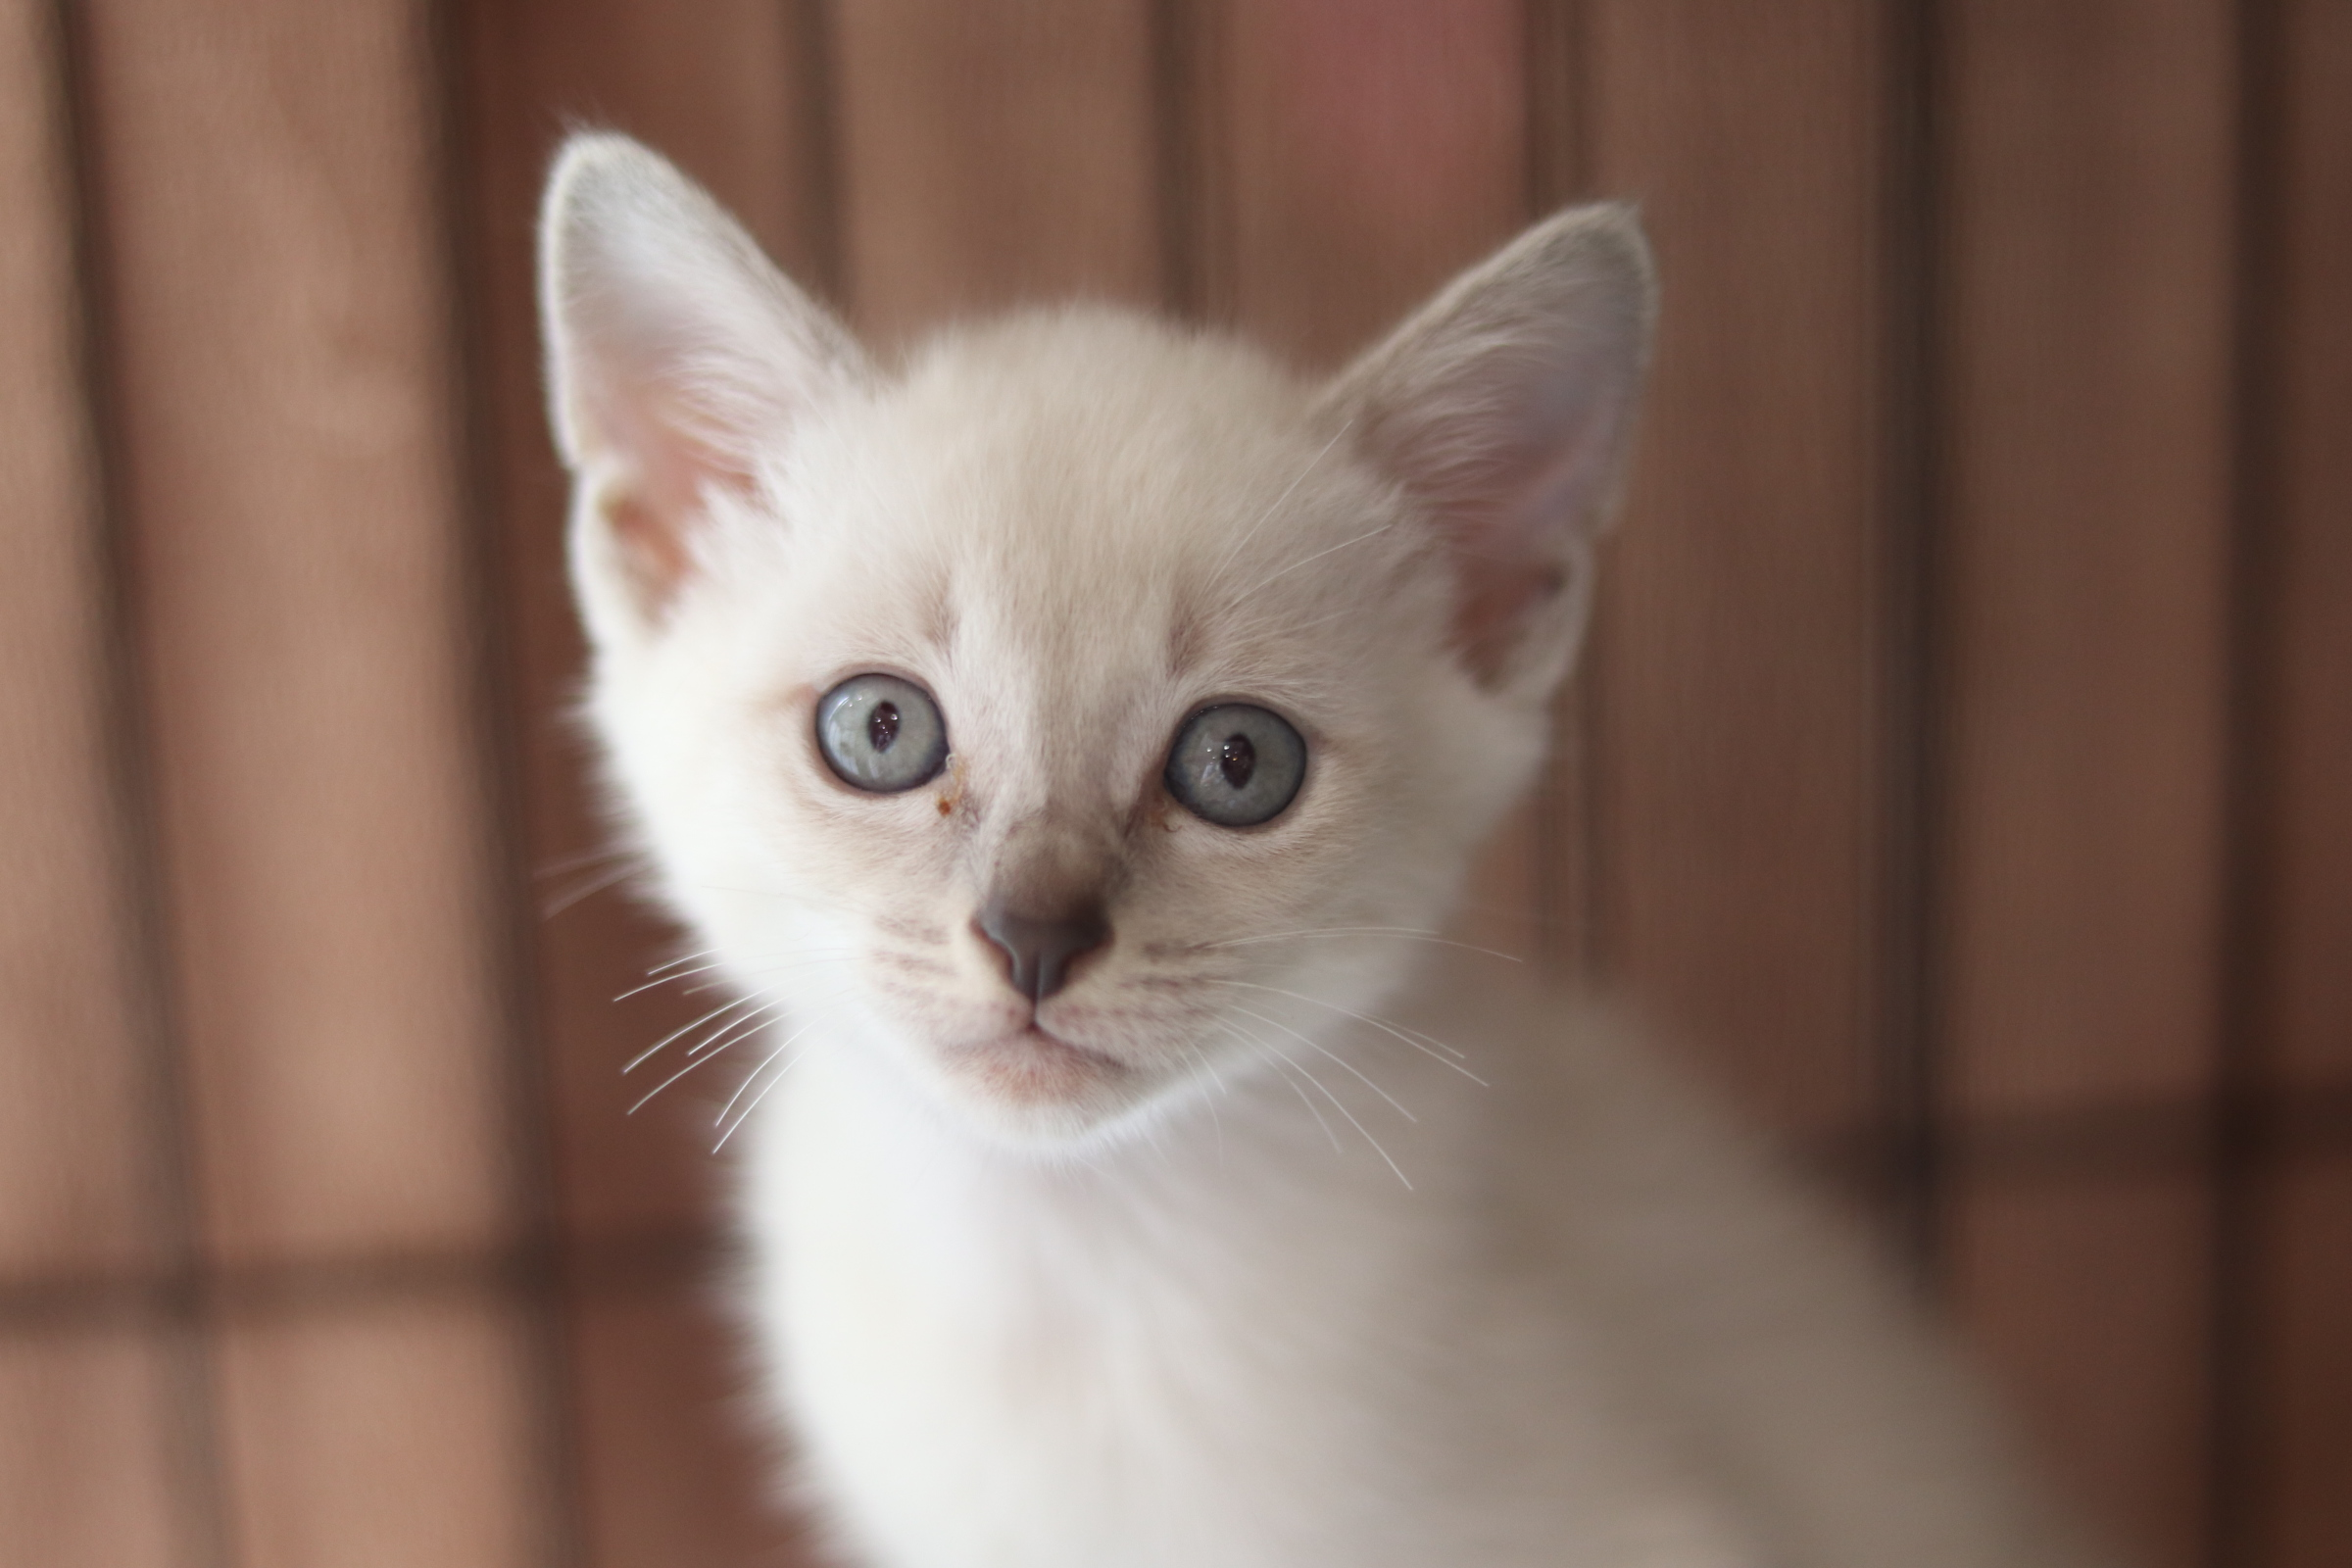 <ul> <li>猫種:日本猫</li> <li>性別:オス</li> <li>名前:名前をつけてあげてね</li> <li>年齢:2021年7月13日頃生まれ</li> <li>保護経緯:野良猫が敷地内で子猫を産んだ</li> </ul>